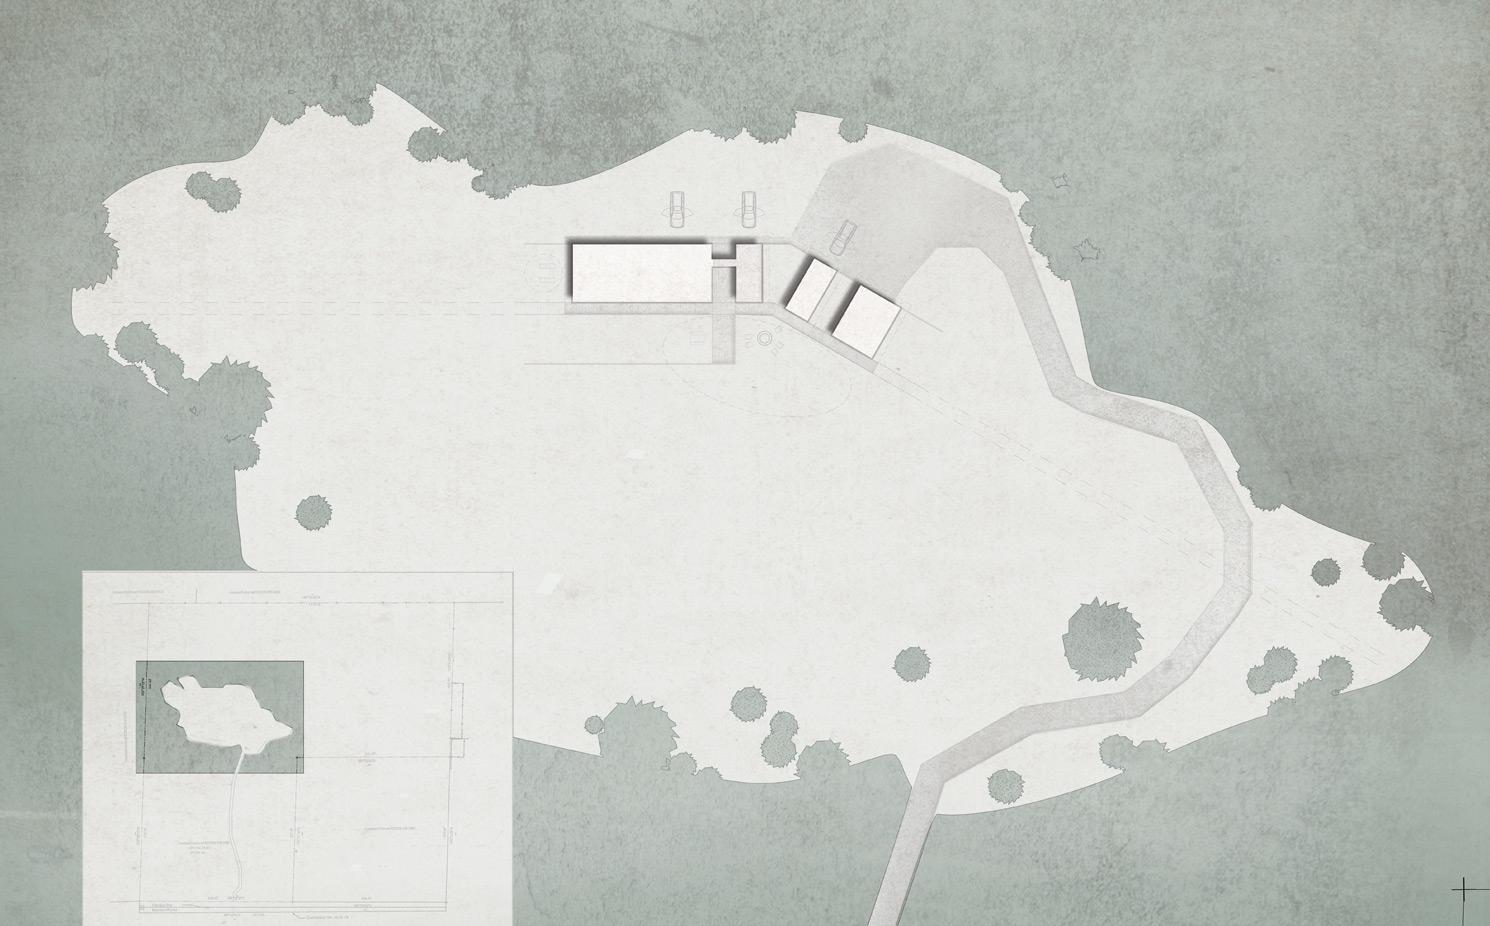 BUILD-LLC-Whidbey-site-plan-option-1.jpg